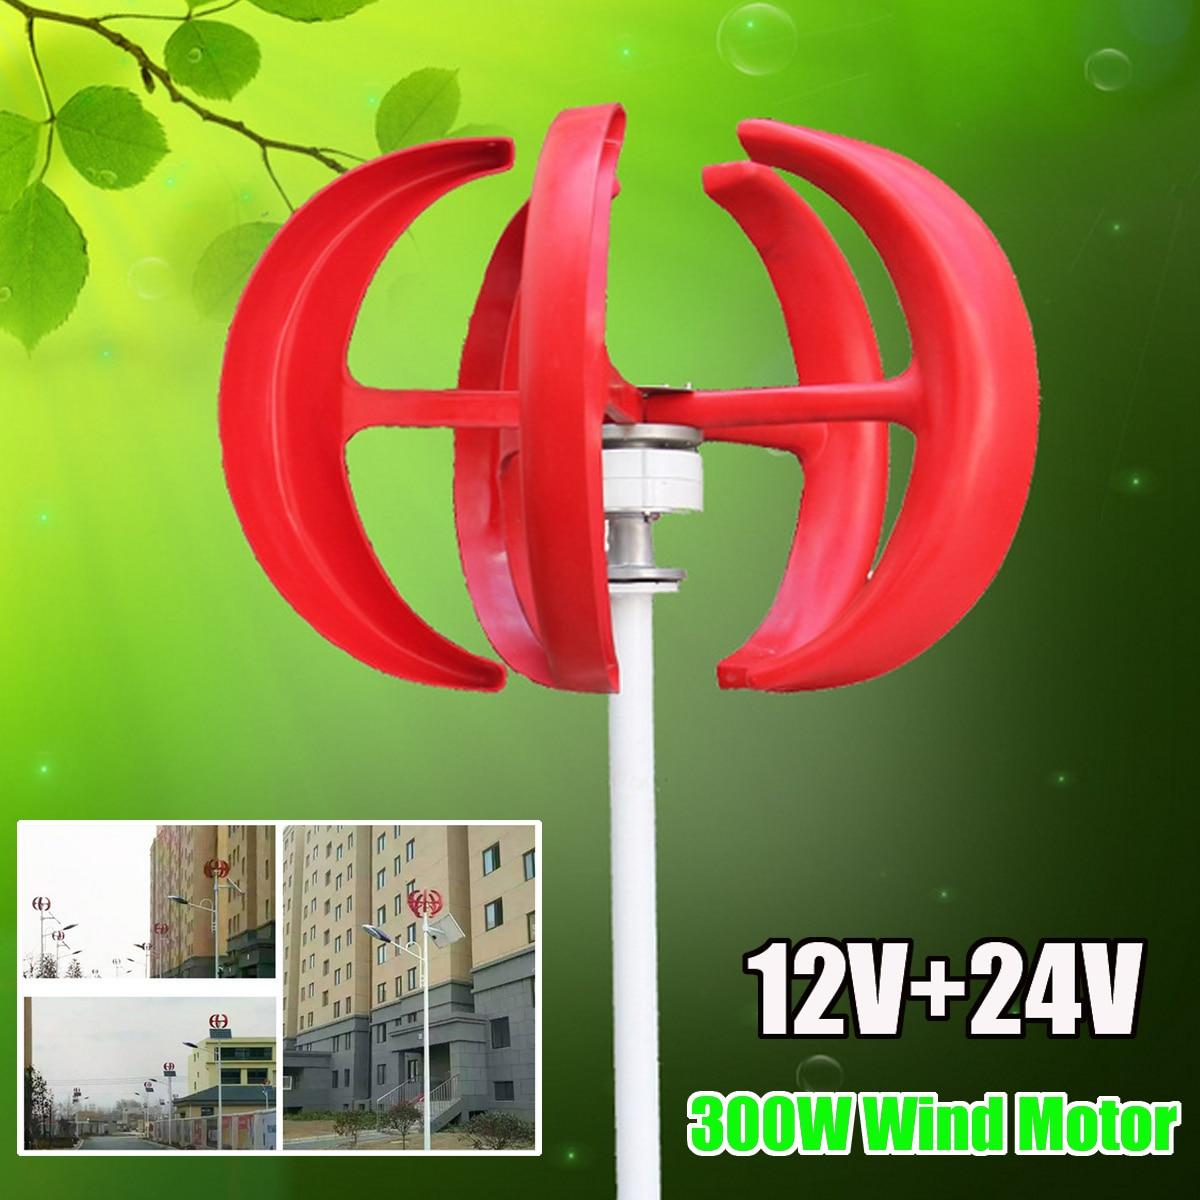 цена на 12V/24V 300W 5 Blades Wind Turbine Generator Power Vertical Axis Red Lantern Energy Fiber 3 Phase AC Permanent Magnet Generator